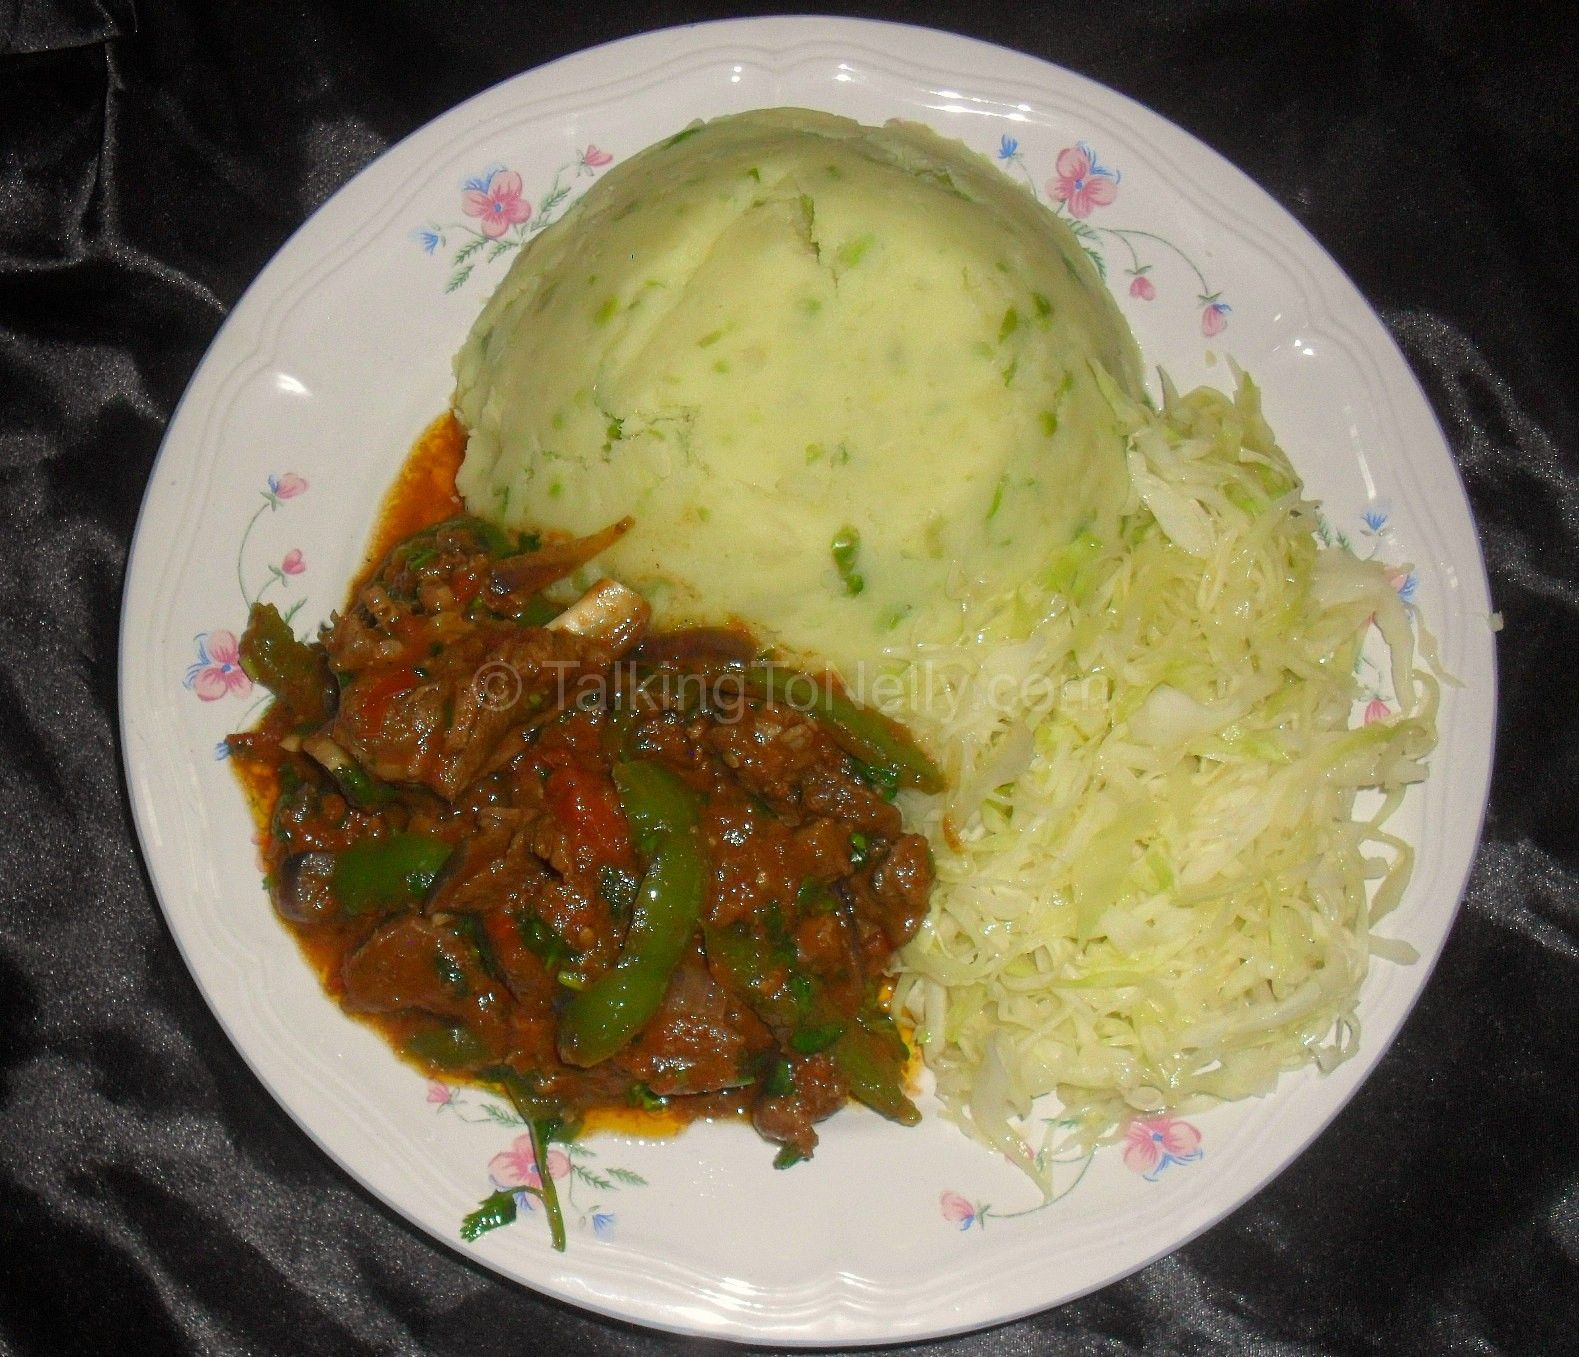 Pin On Talkingtonelly Com My Blog 3 Kenya Food